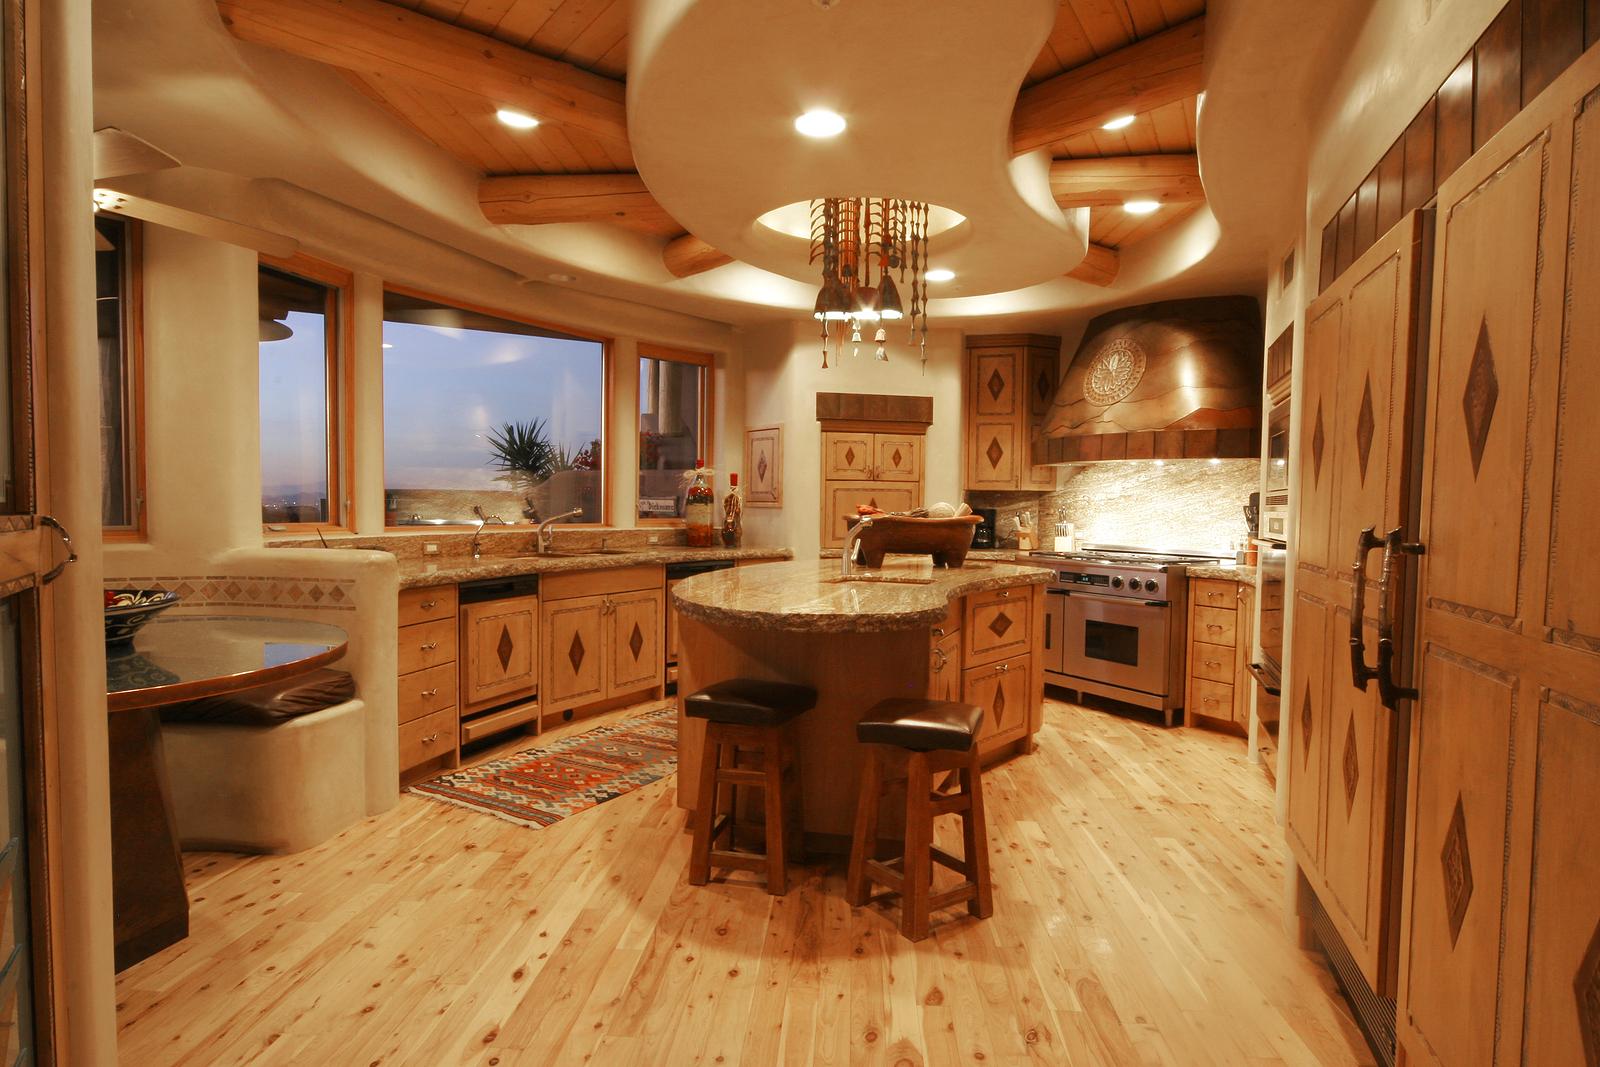 Home styles kitchen island Photo - 5 | Kitchen ideas